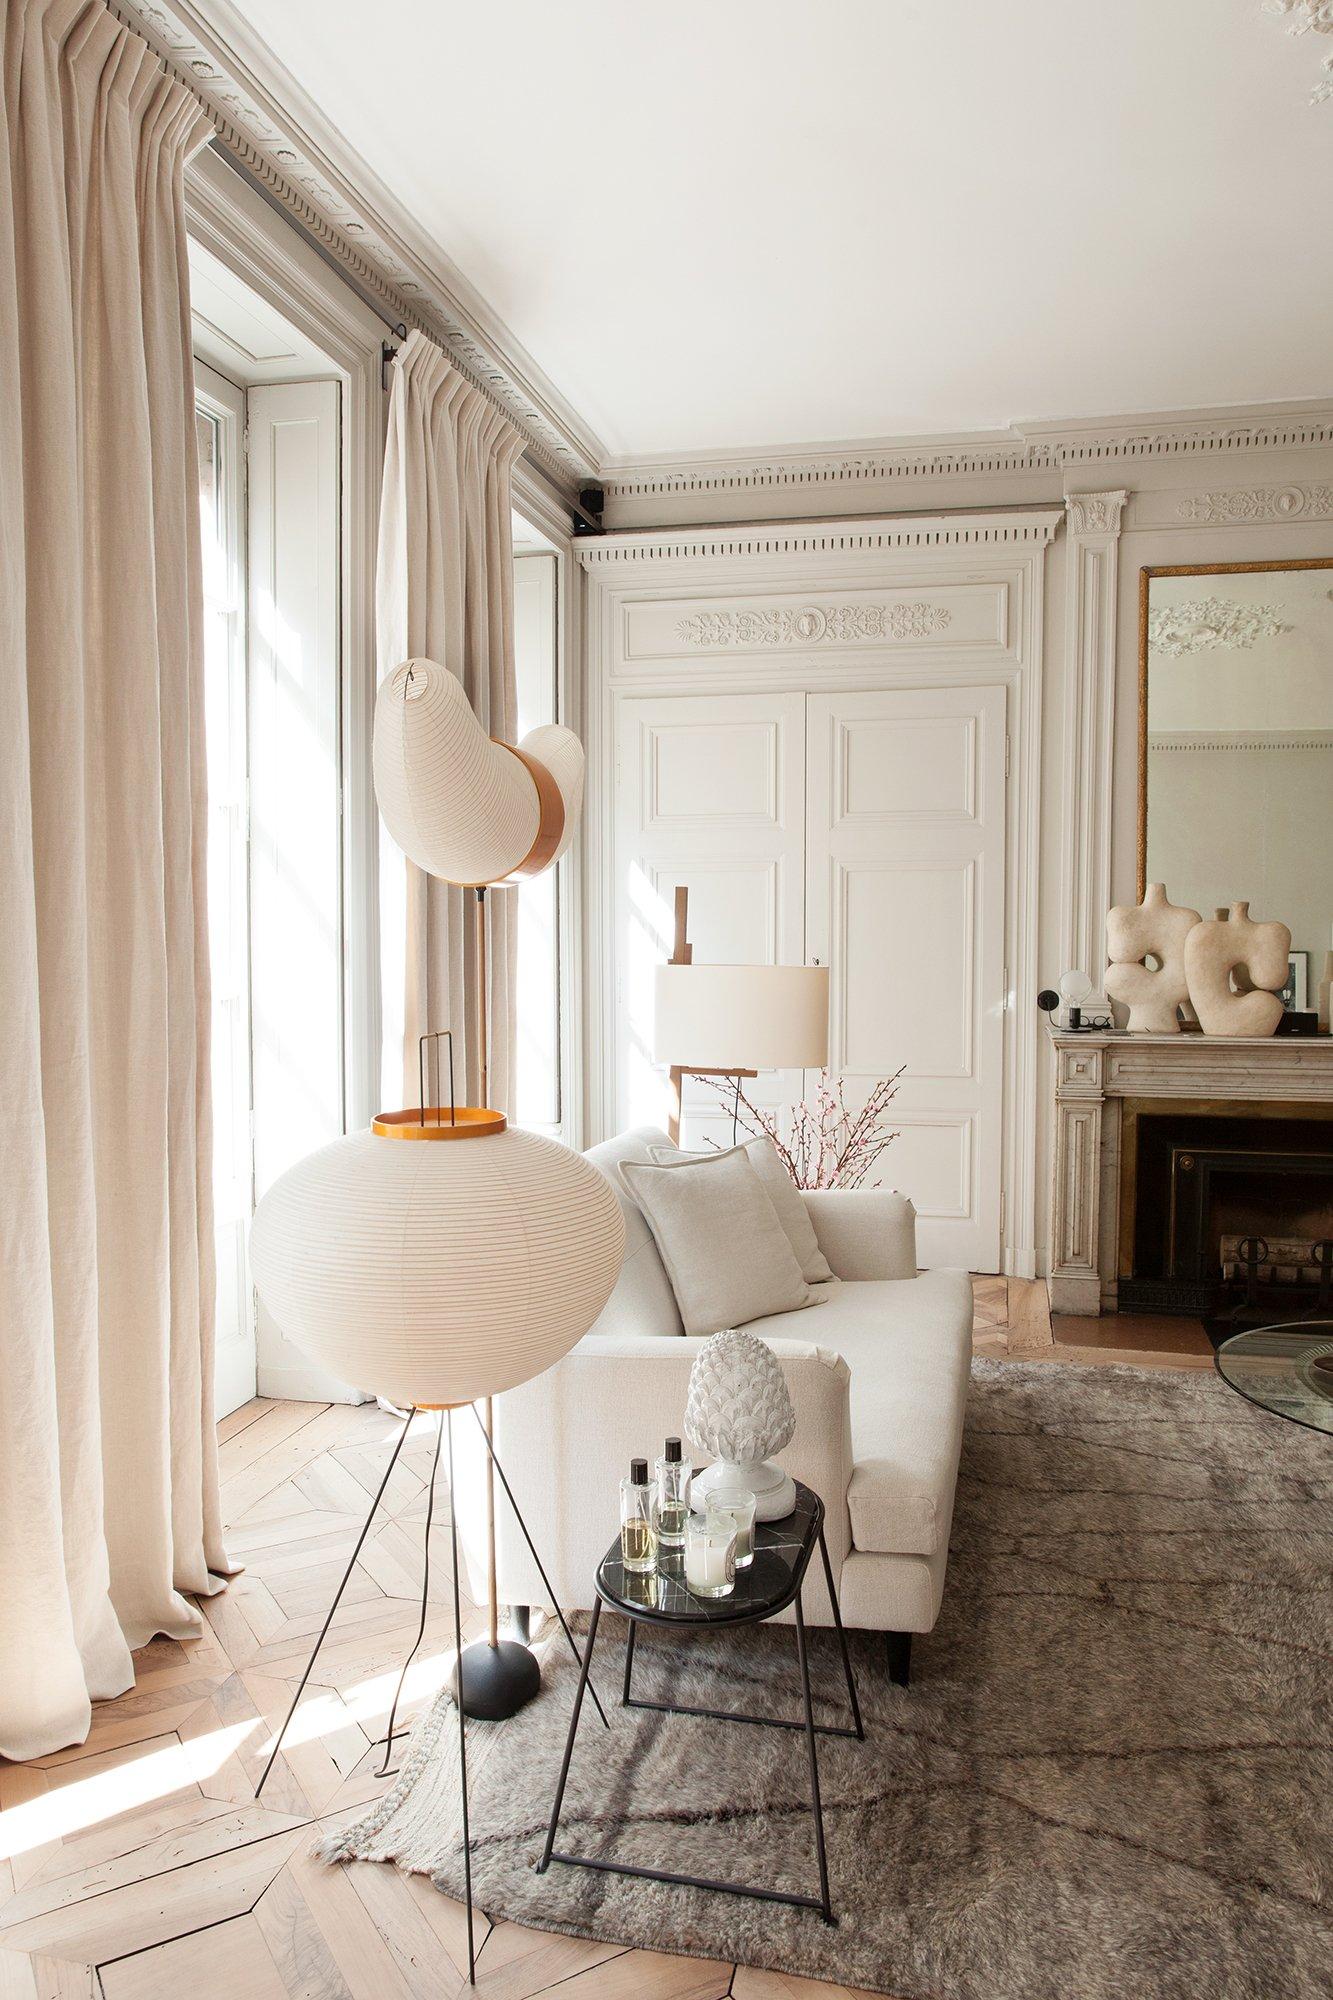 Maison Hand, entre artisanat et modernisme - The Socialite ...